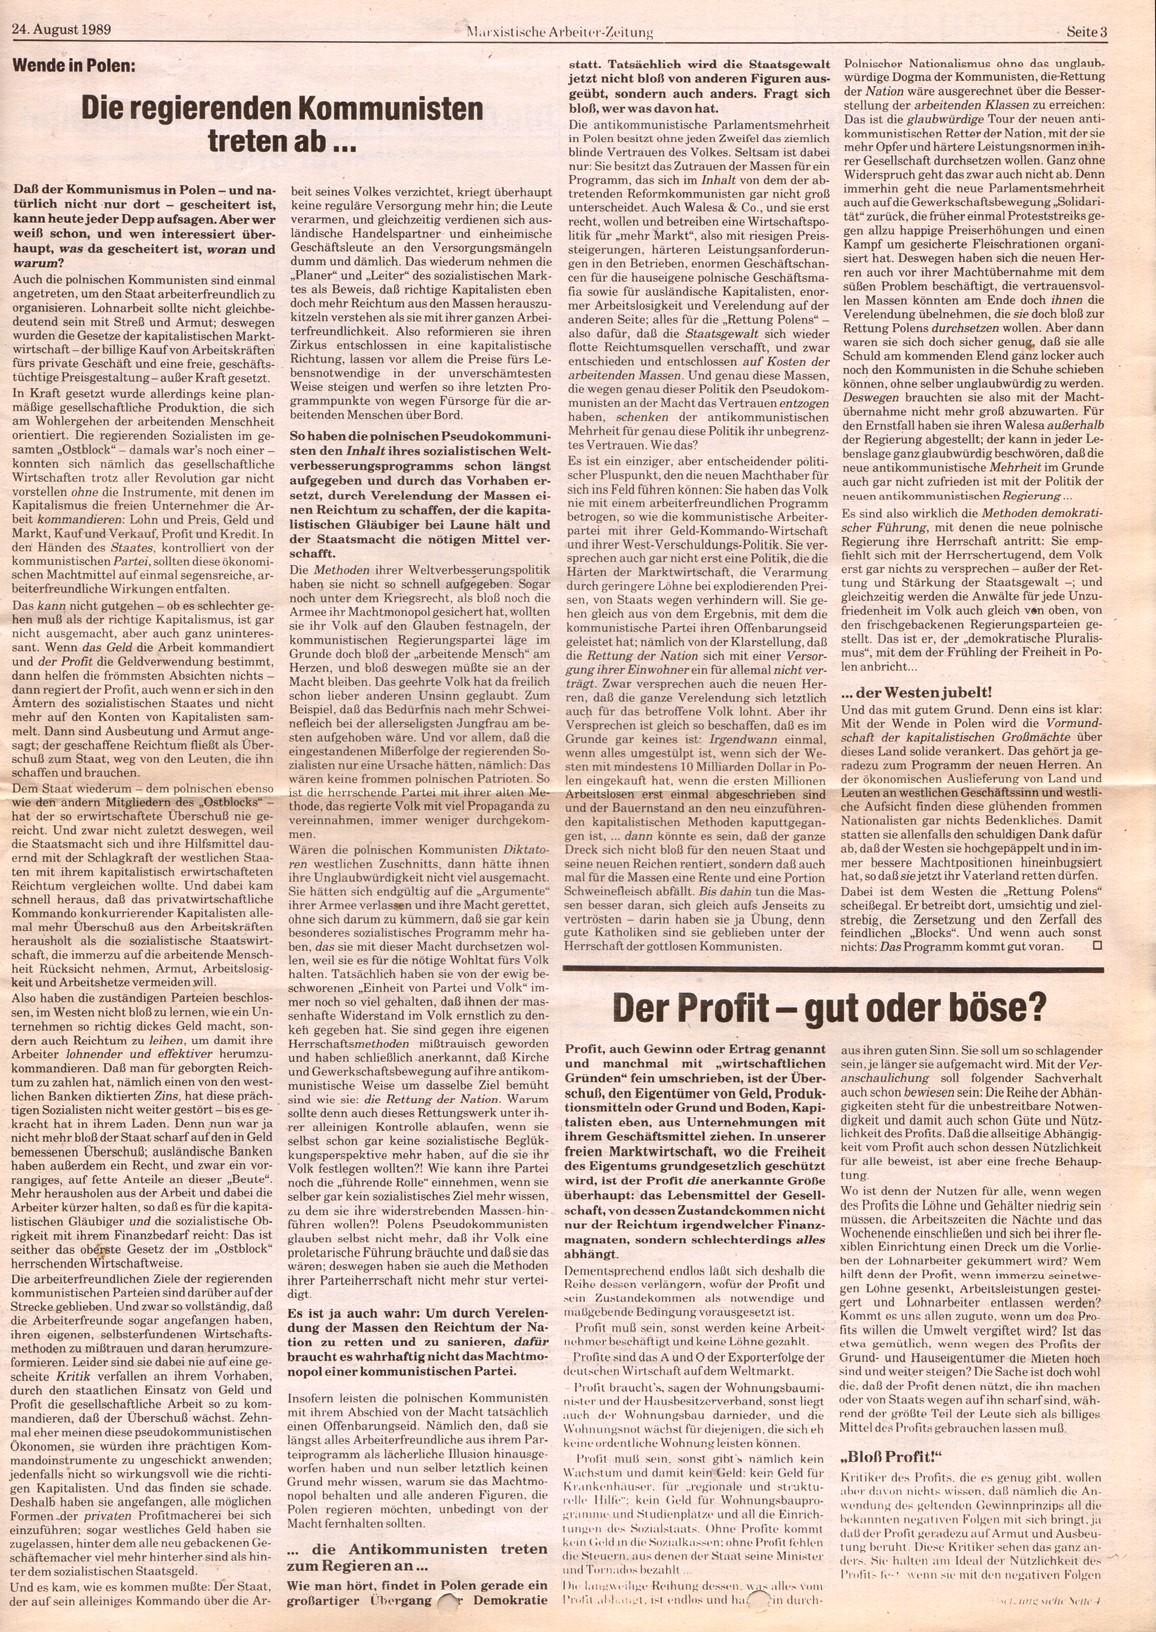 Muenchen_MG_MAZ_19890824_03